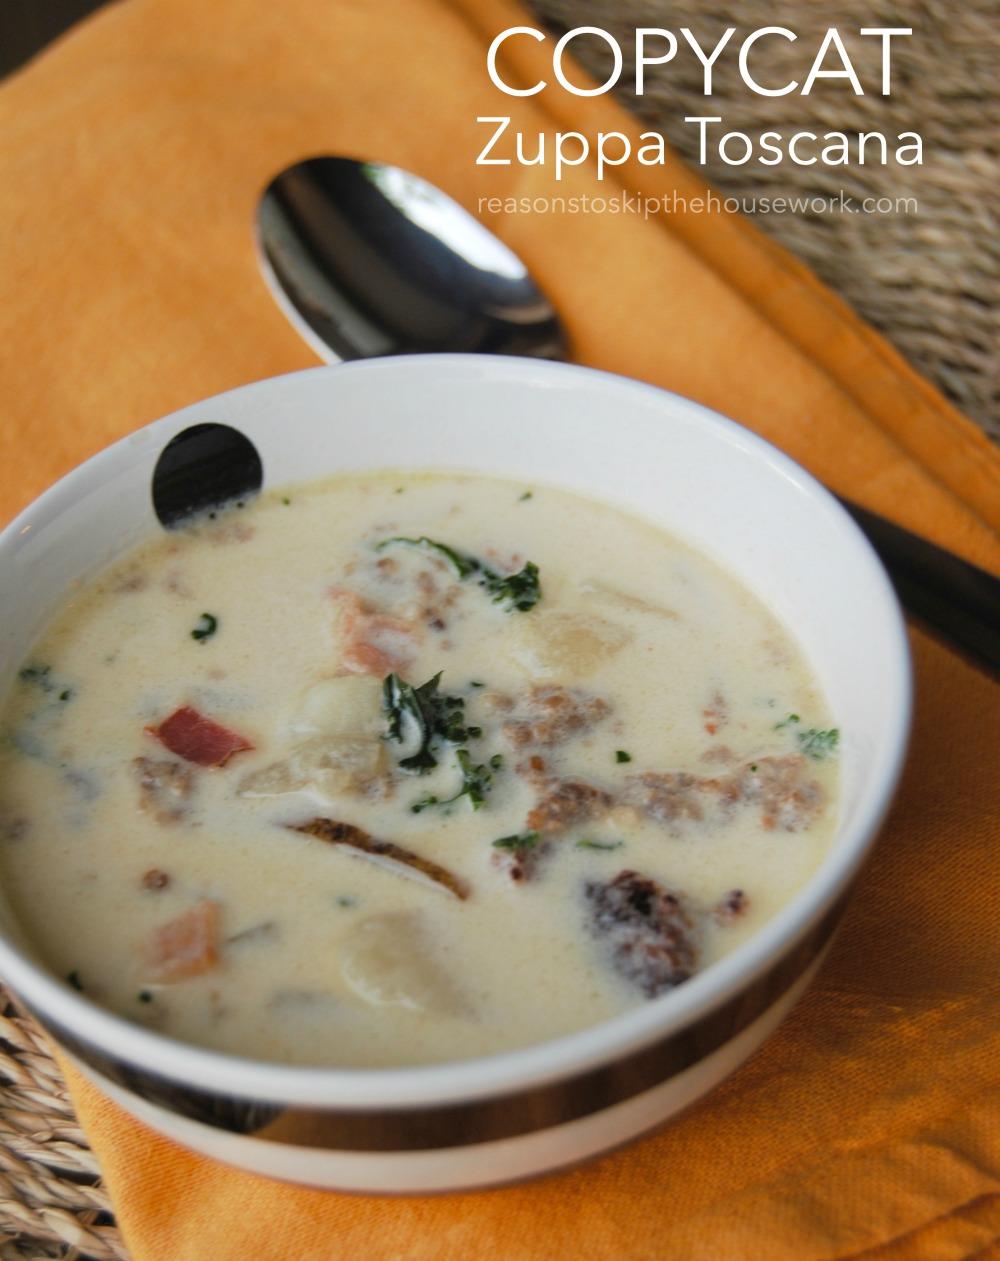 Zuppa toscana recipe olive garden copycat - Olive garden zuppa toscana copycat ...